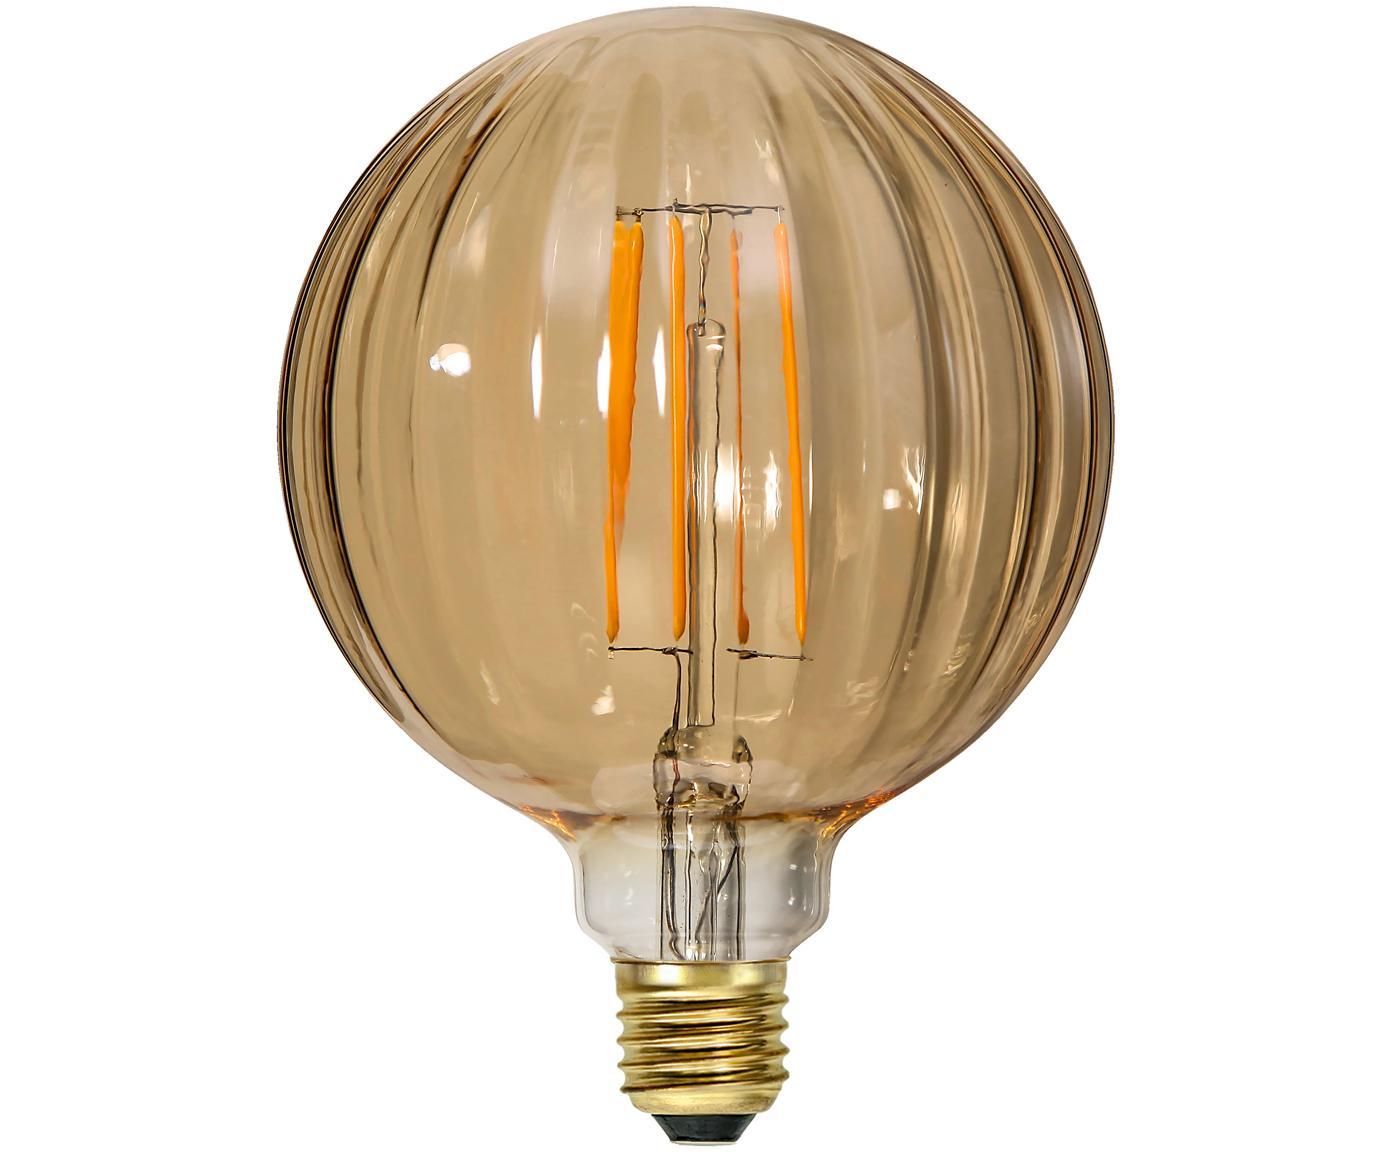 Bombilla LED Circy (E27/3W), Ampolla: vidrio, Casquillo: níquel, Ámbar, Ø 13 x Al 17 cm